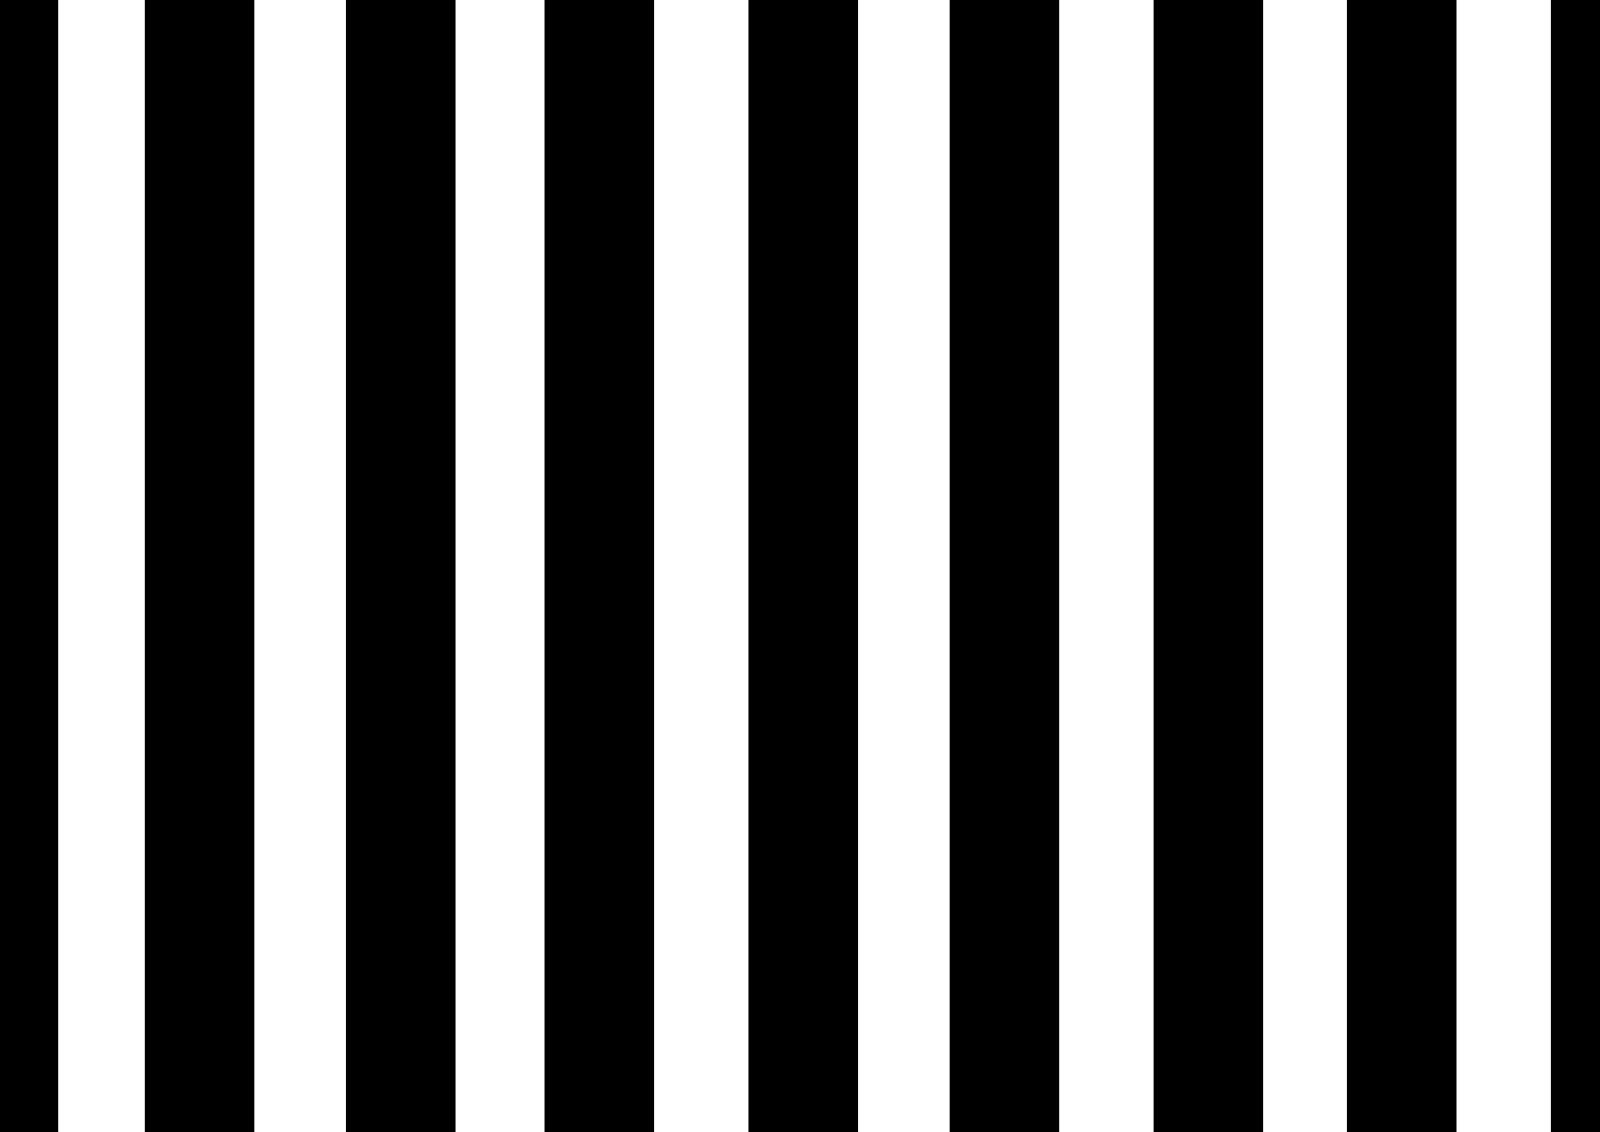 [49+] Black and White Striped Wallpaper on WallpaperSafari